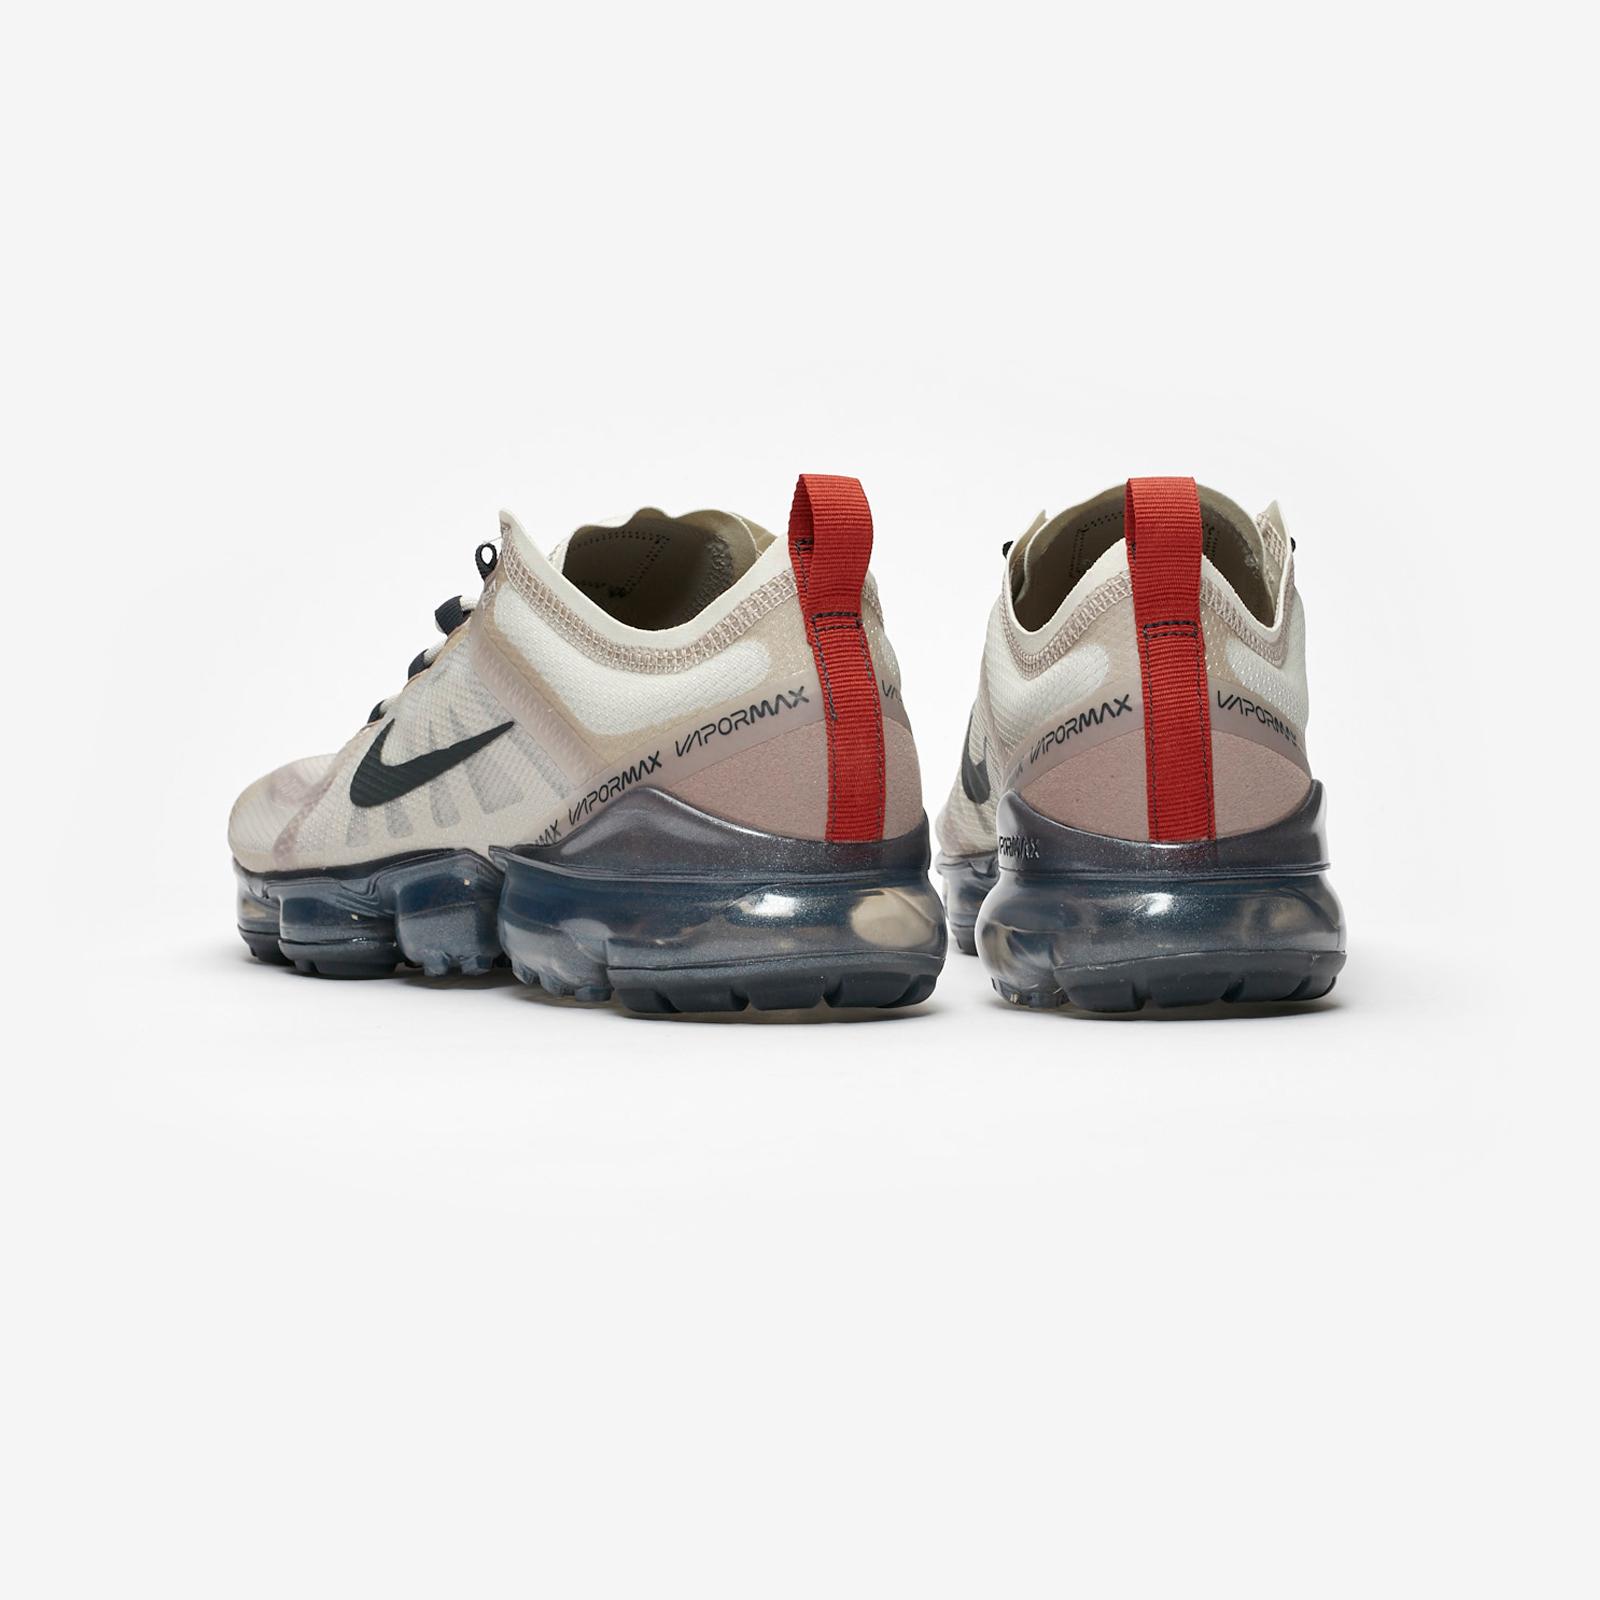 Nike Air Vapormax 2019 Ar6631 200 Sneakersnstuff